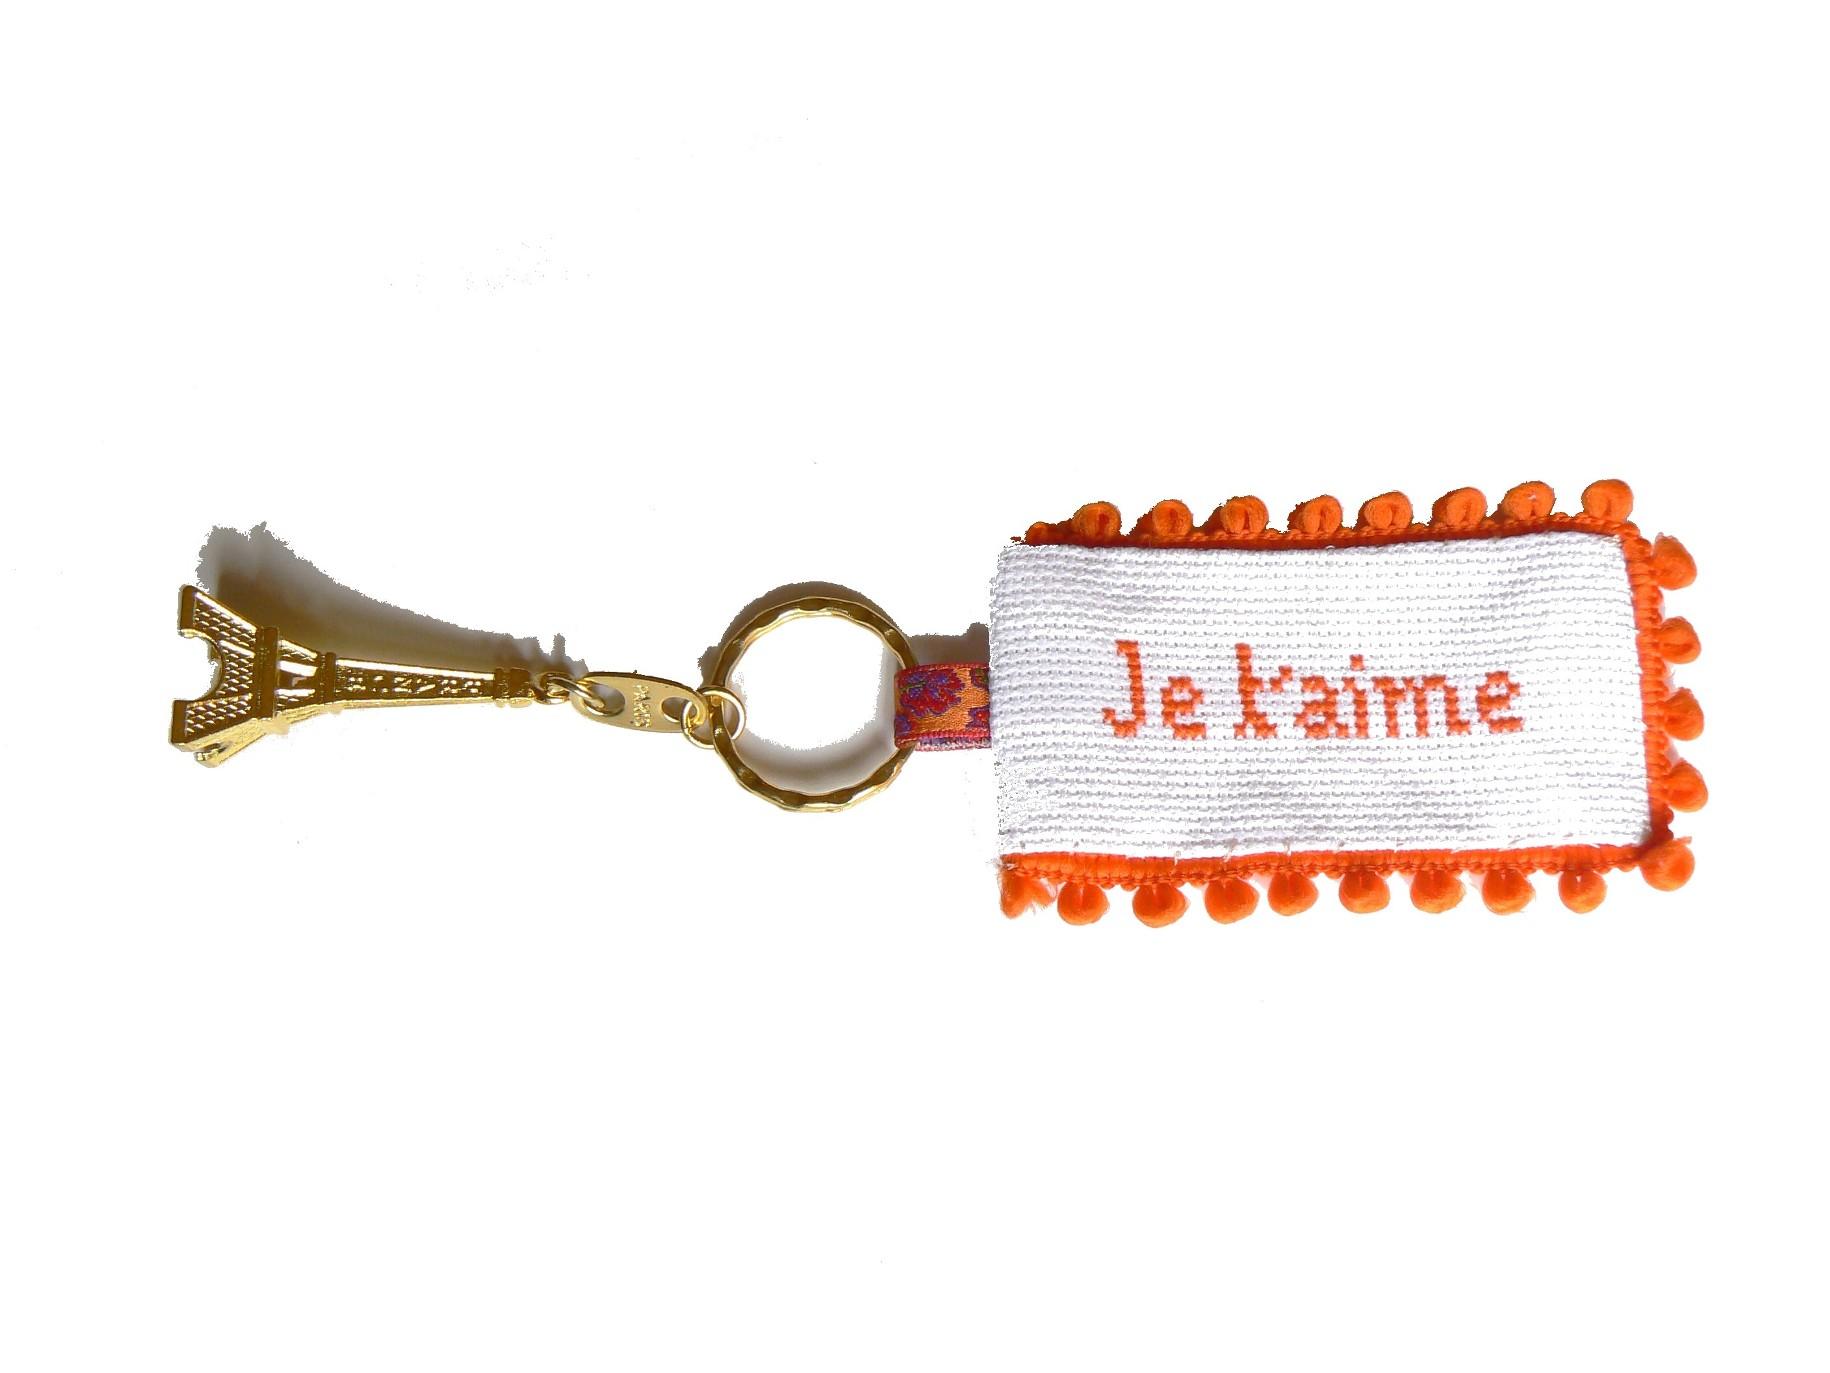 porte-cle-aida-jetaime-orange-autour-d-elsa